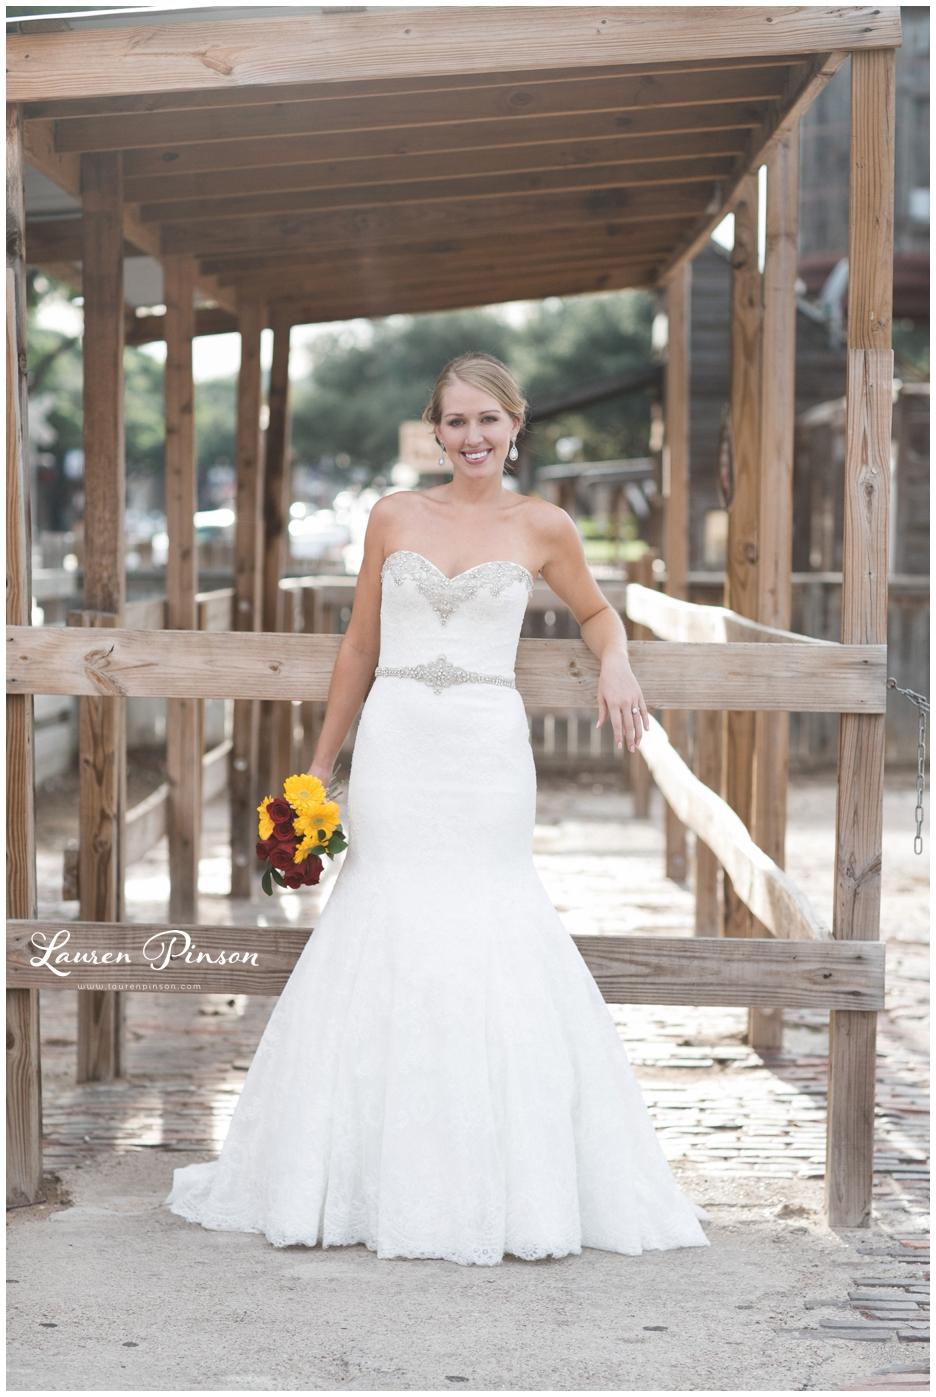 fort-worth-bridal-session-at-the-stockyards-fort-worth-wedding-photographer-wichita-falls-wedding-photographer_1325.jpg